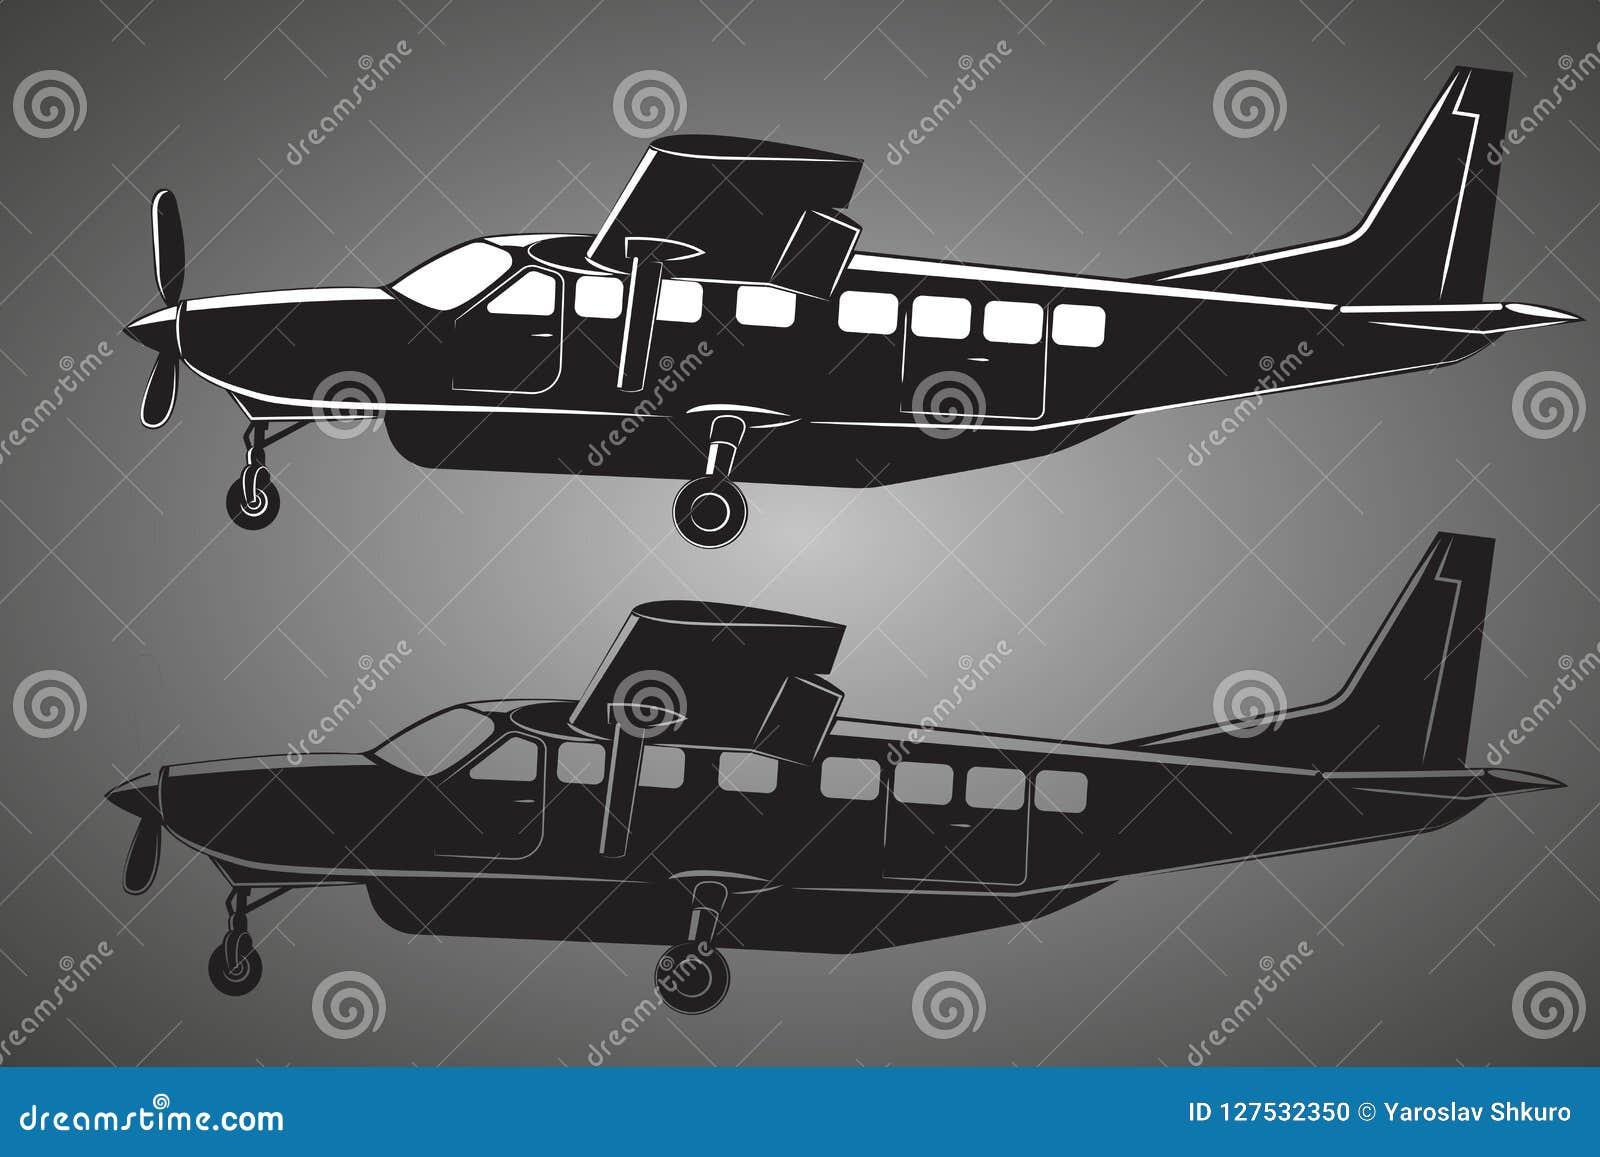 Gippsland GA8 Airvan Light Utility Aircraft